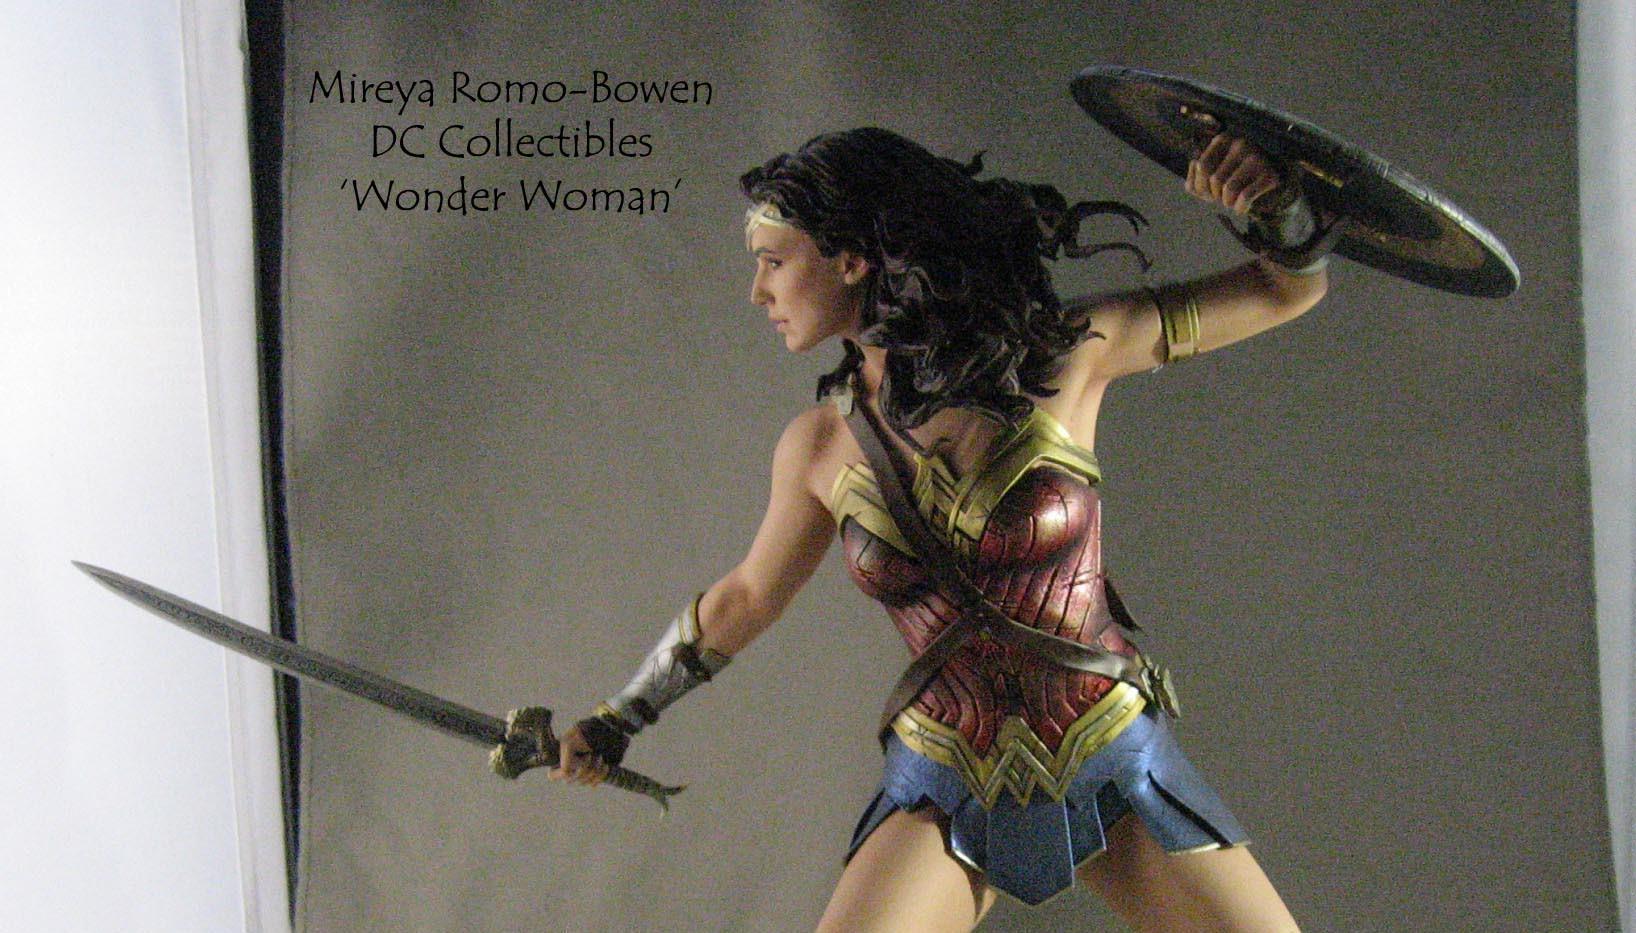 Wonder Woman MRB.jpg